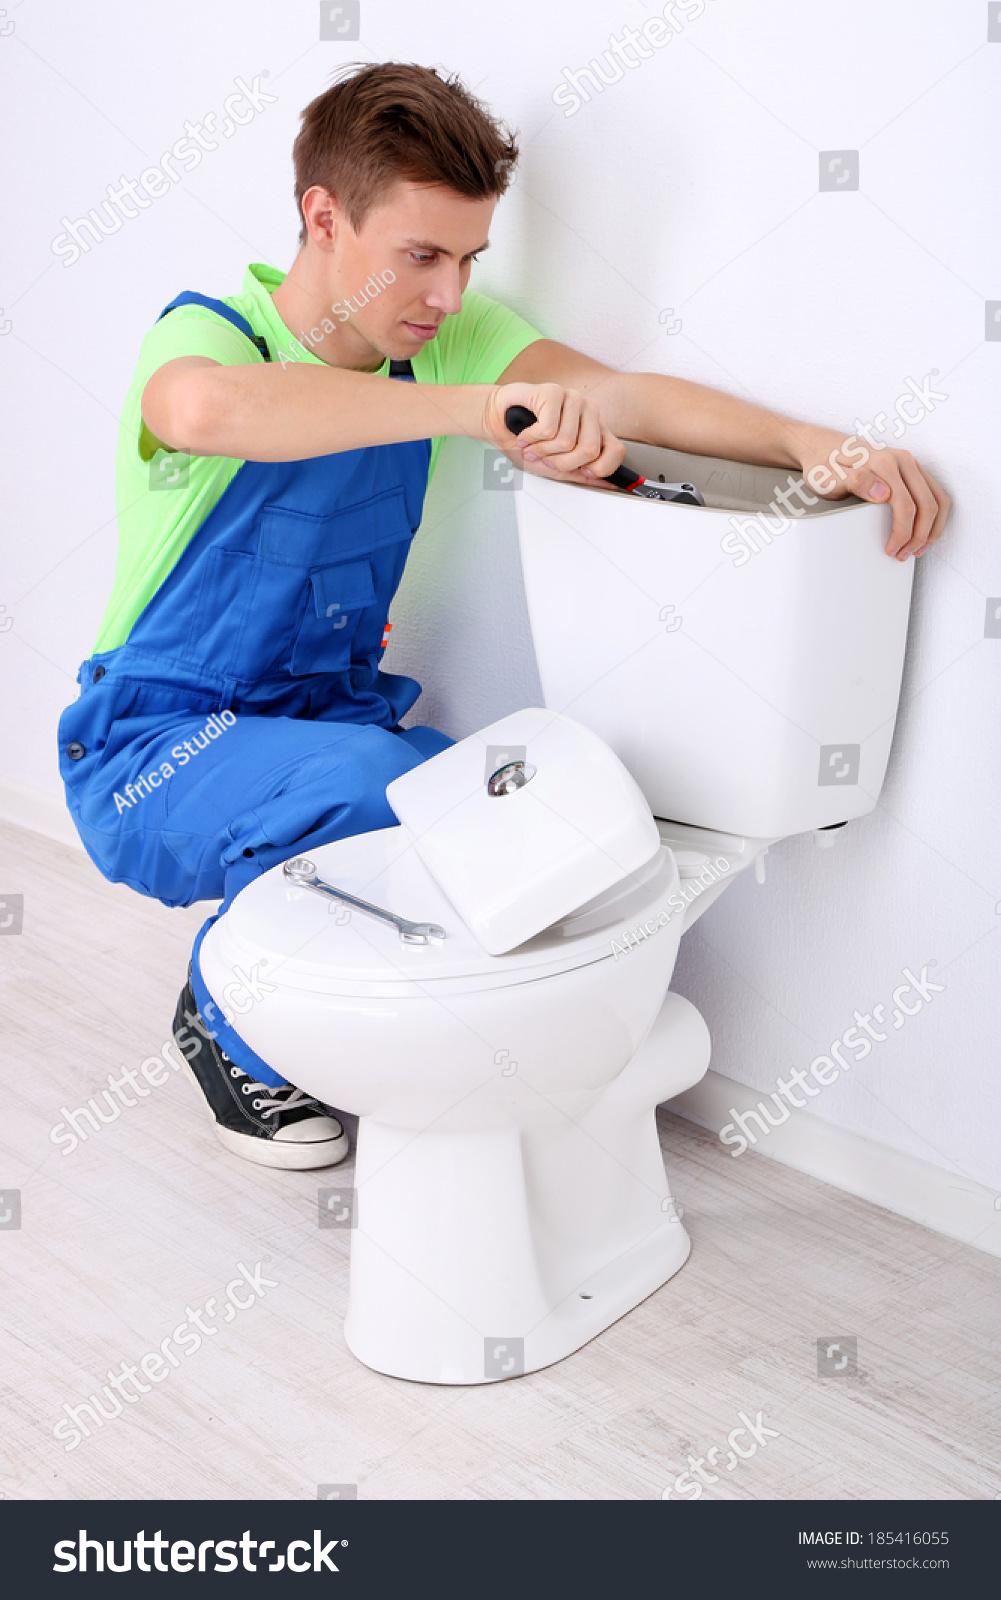 Plumber Toilet Plunger On Light Background Stock Photo (Edit Now ...